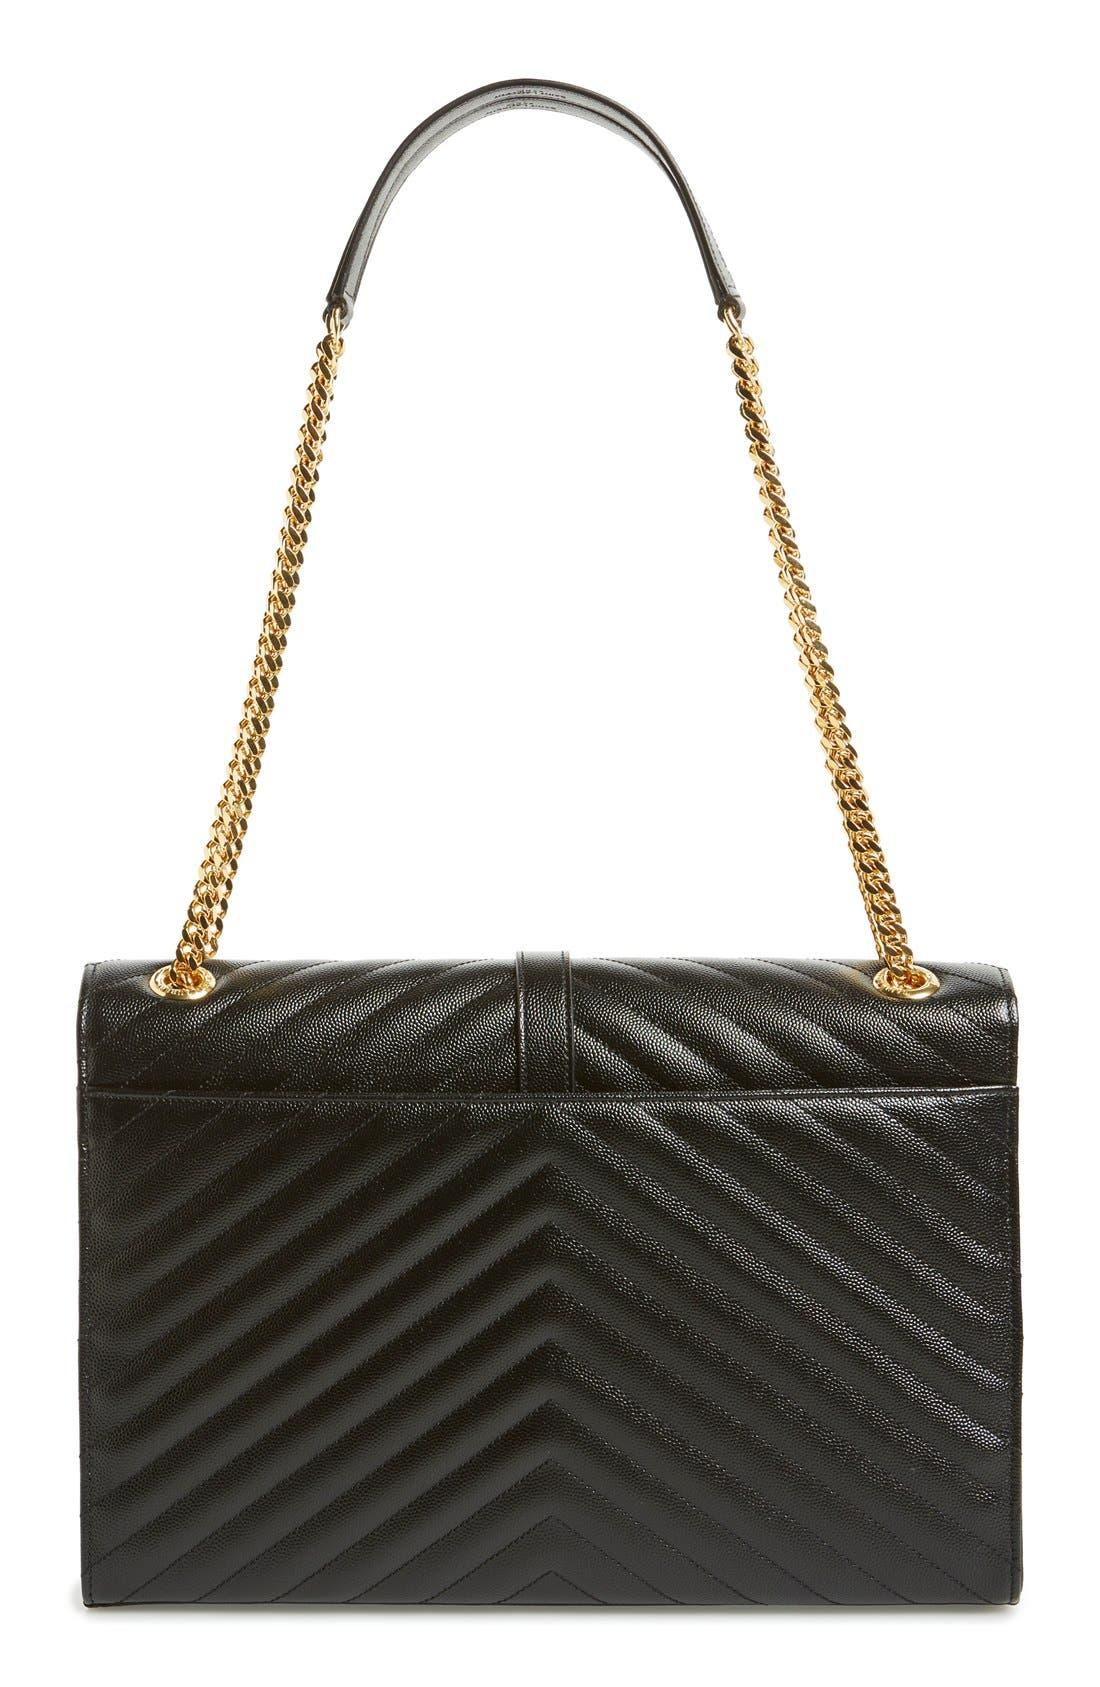 'Large Monogram' Grained Leather Shoulder Bag,                             Alternate thumbnail 3, color,                             Nero/ Gold Hdwr